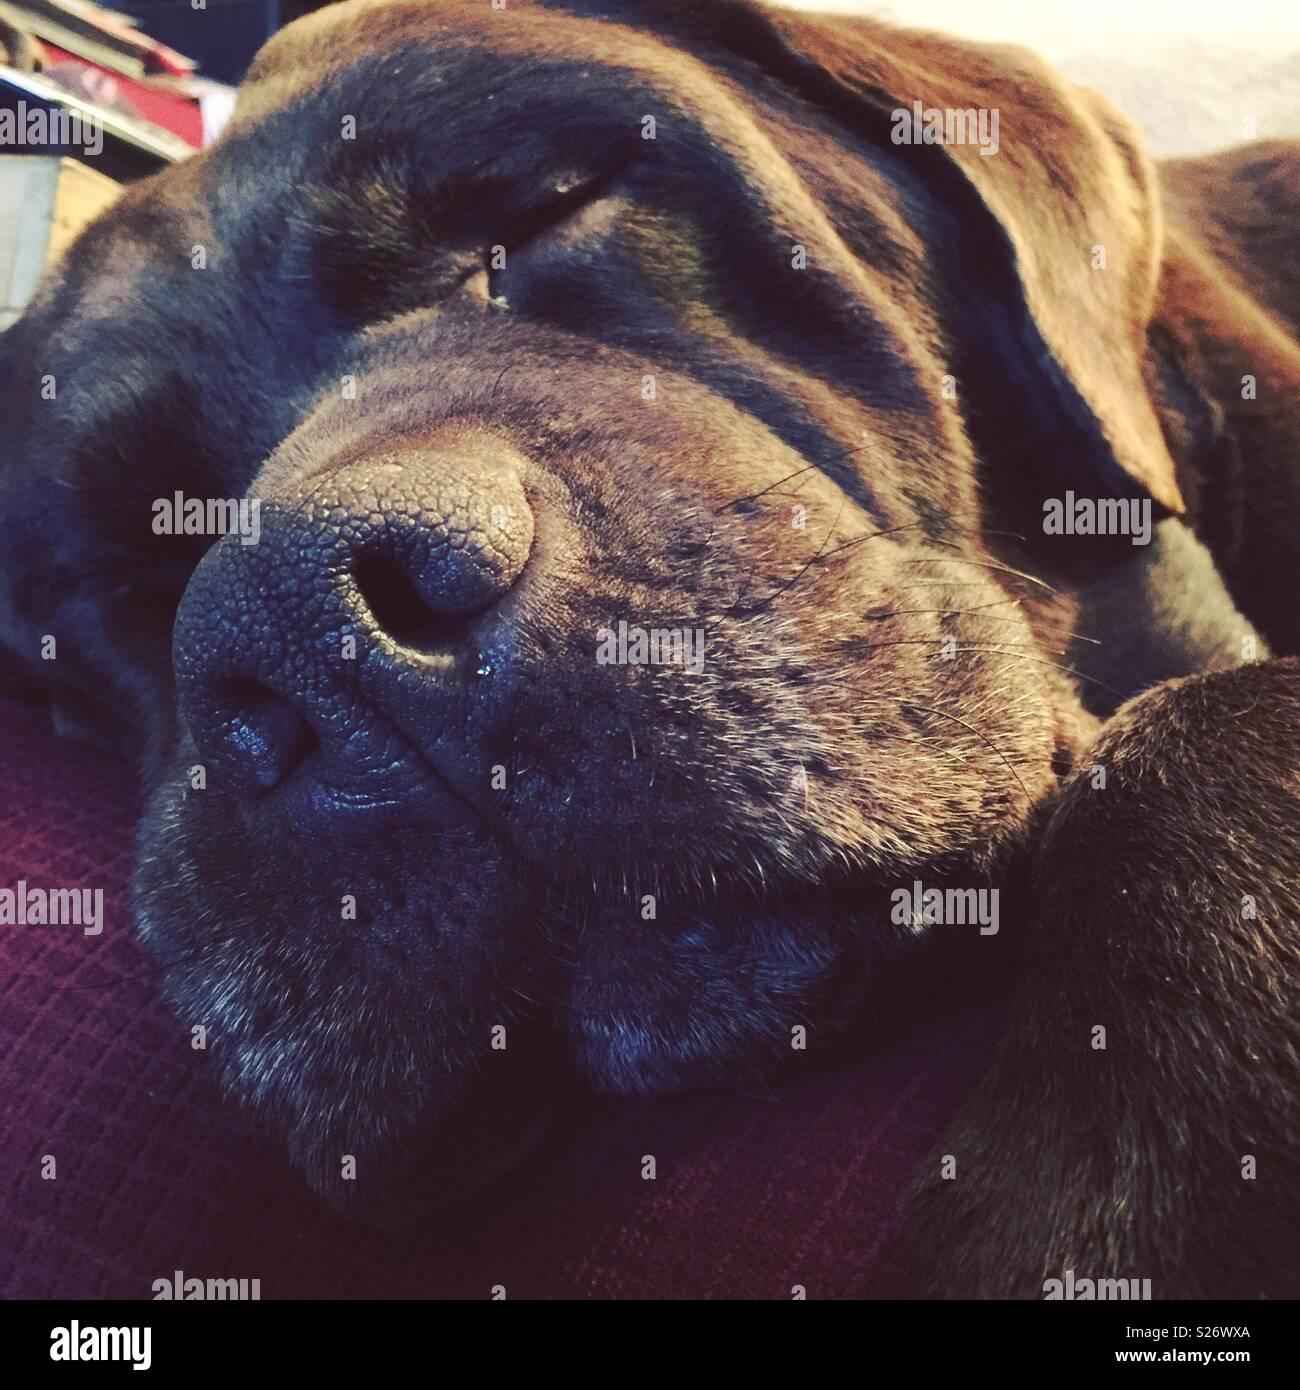 Sleepy Scooby the chocolate Labrador - Stock Image